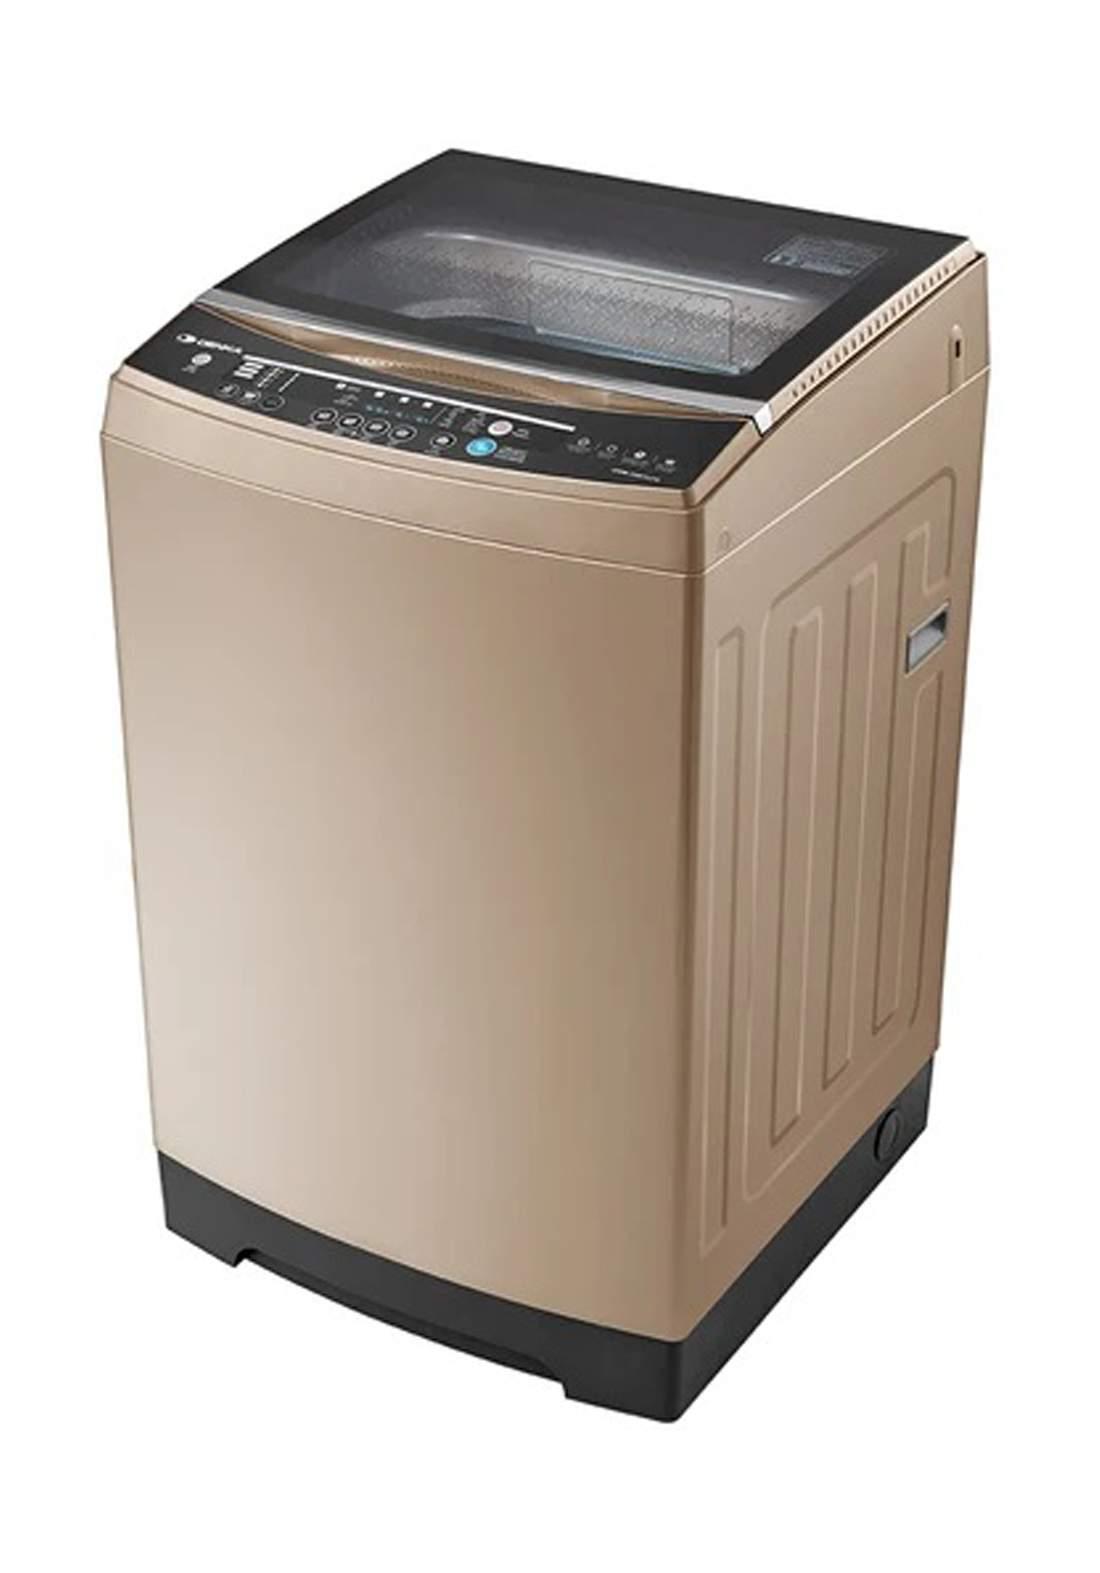 DENKA QWM-1950TLCG washing machine 19kg  غسالة ملابس